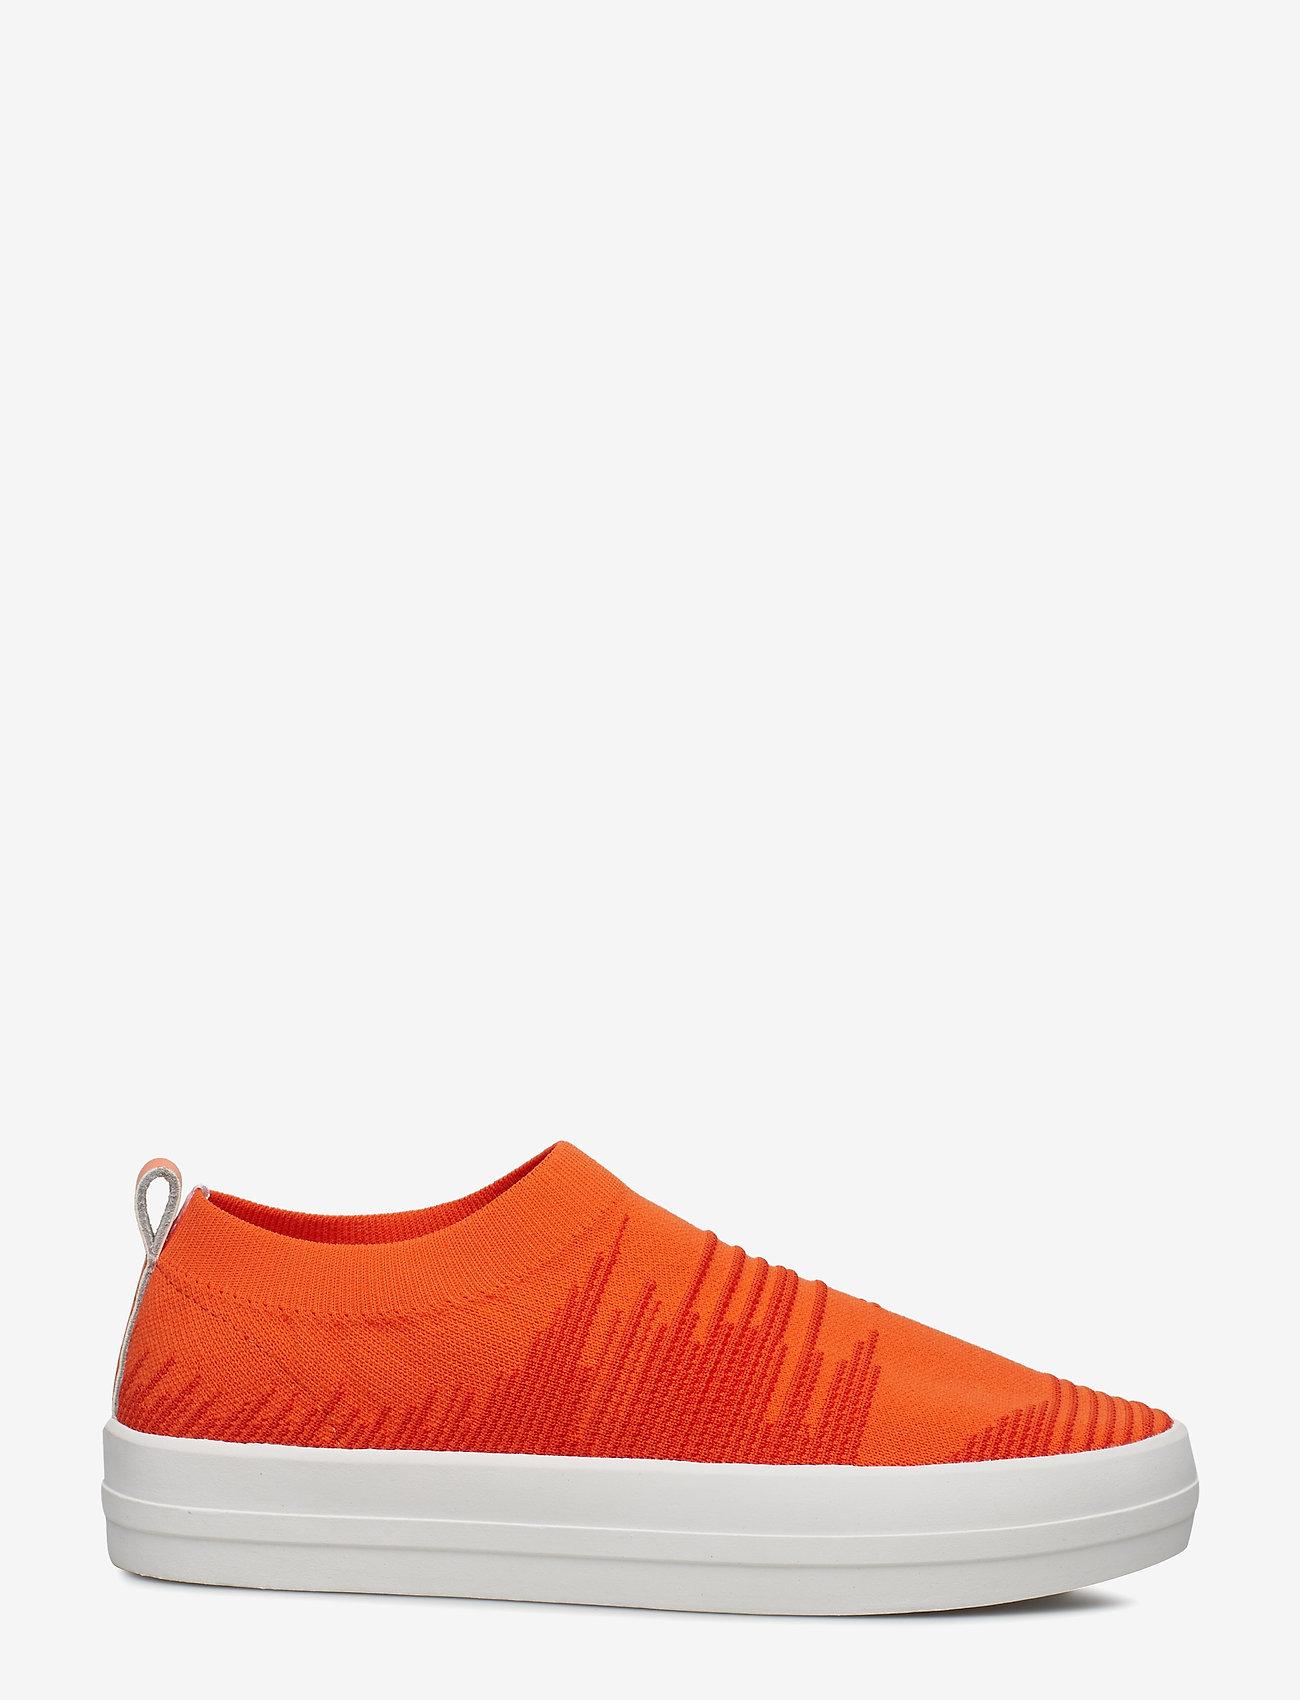 Neela Knit (Coral Red) - Shoe The Bear 1k1jIW